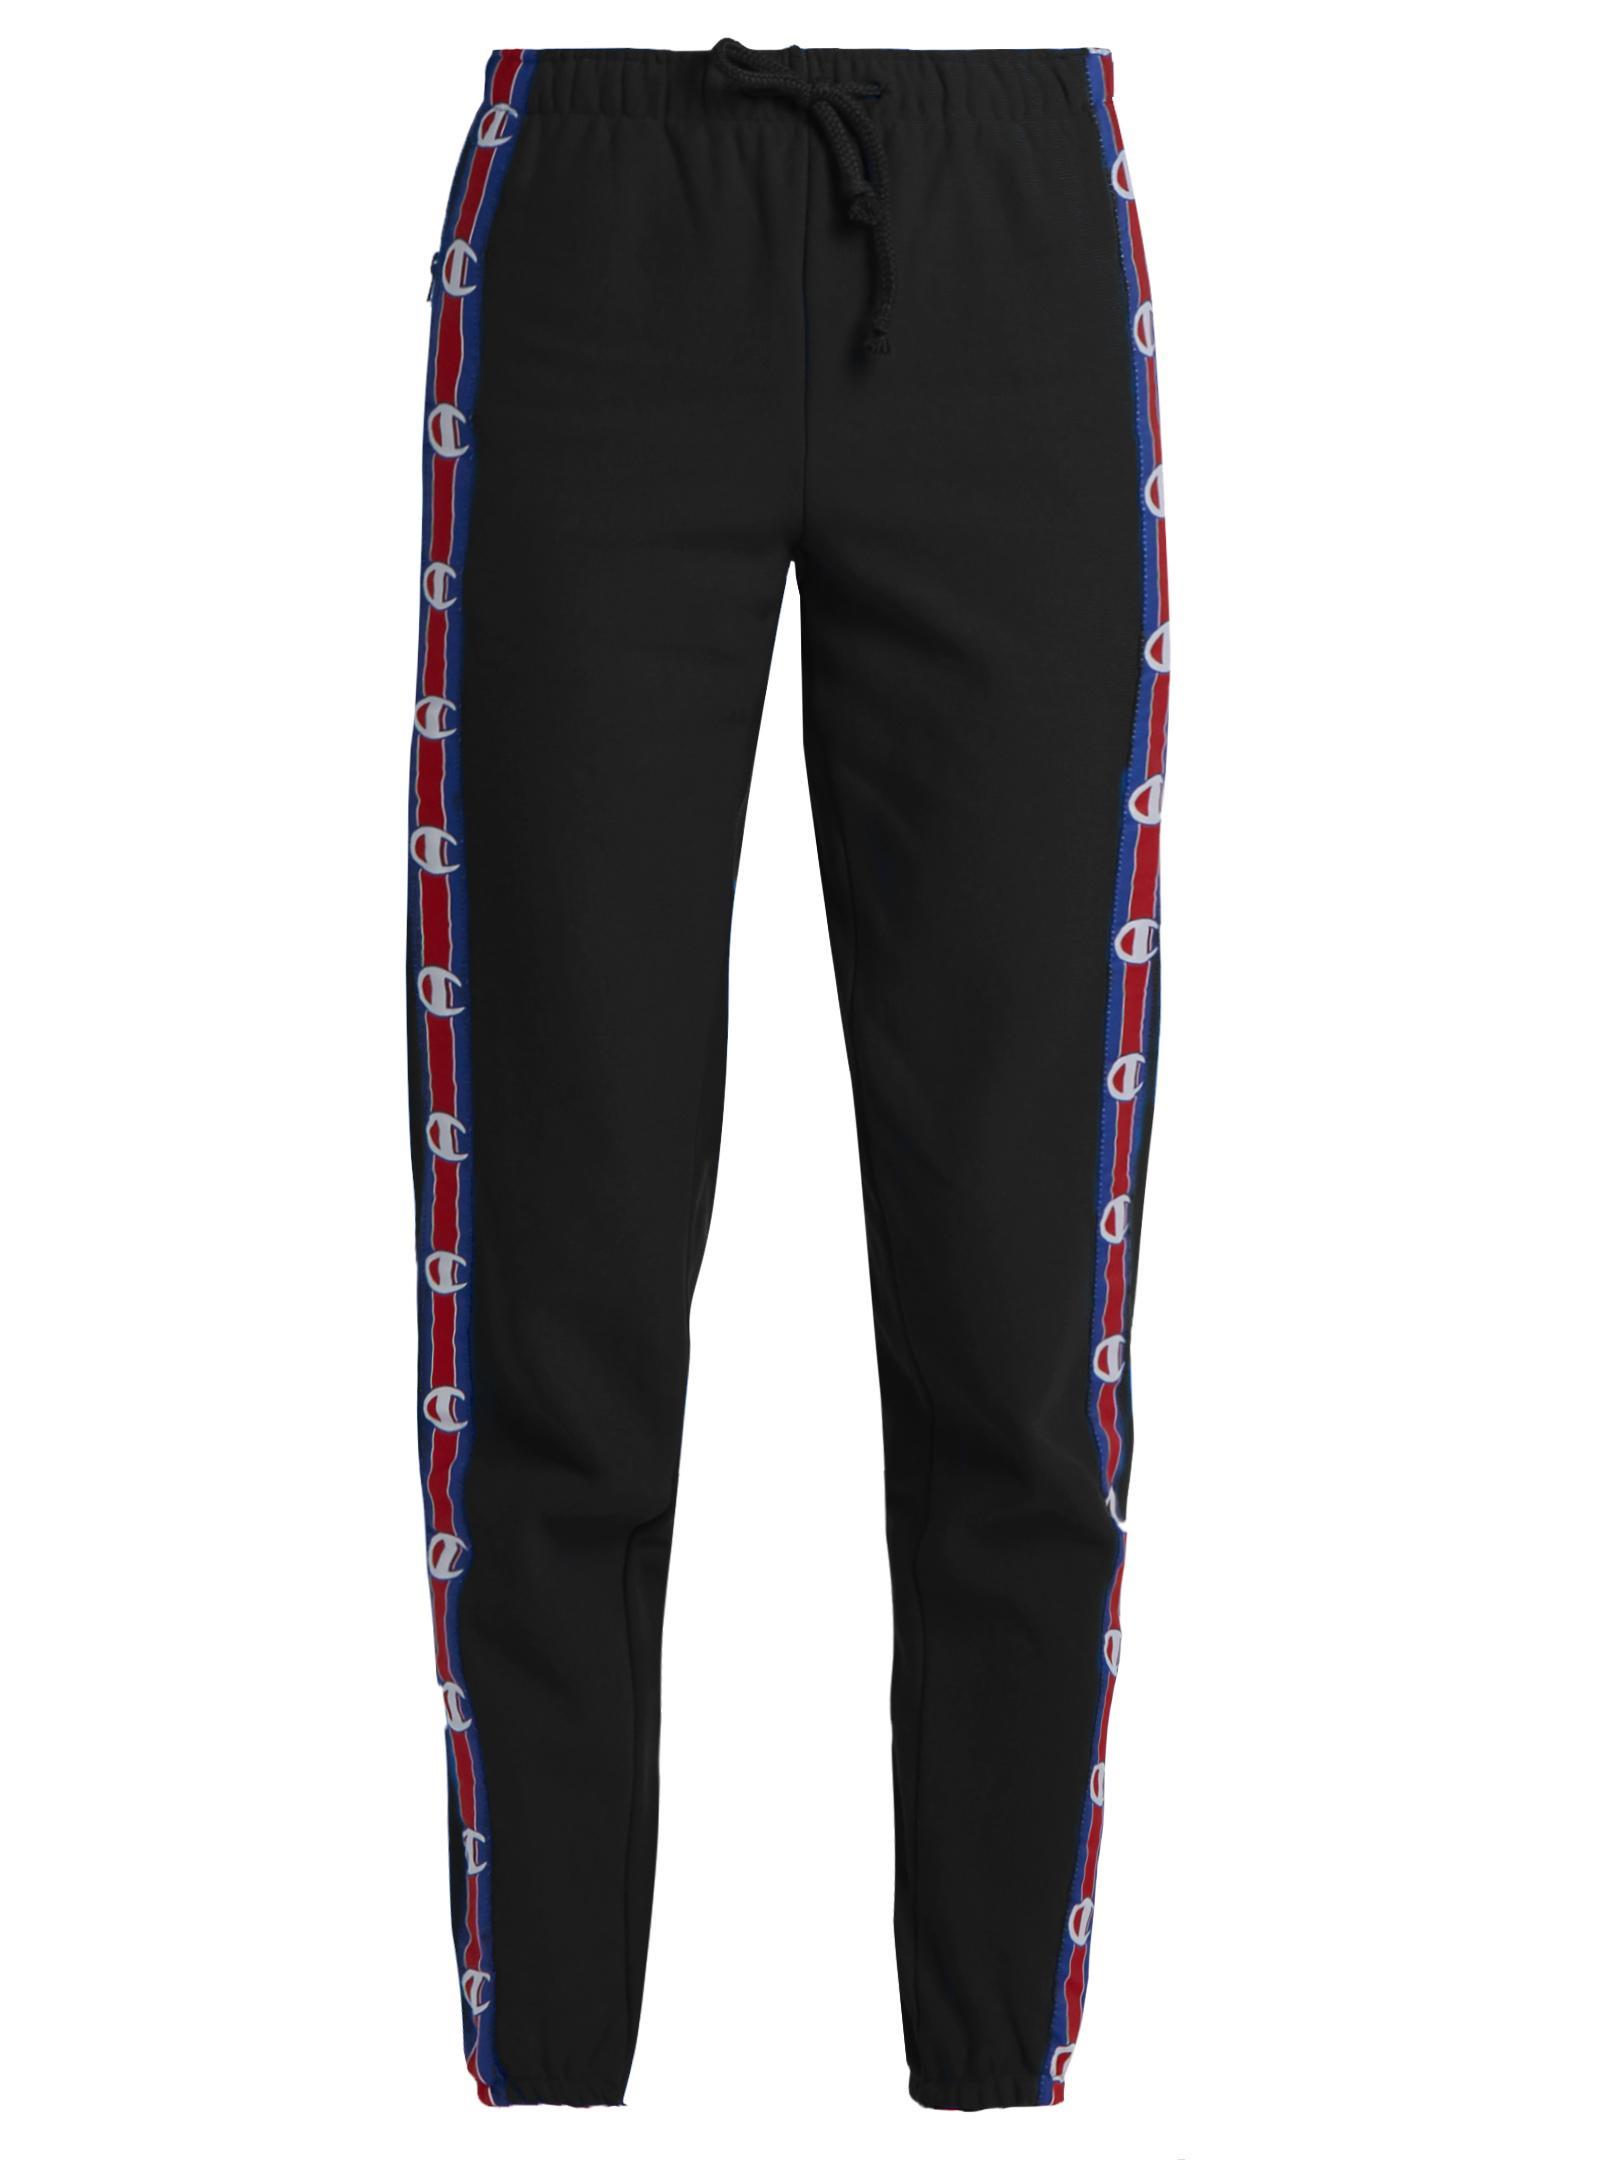 Vetements X Champion Cotton-blend Track Pants in Black